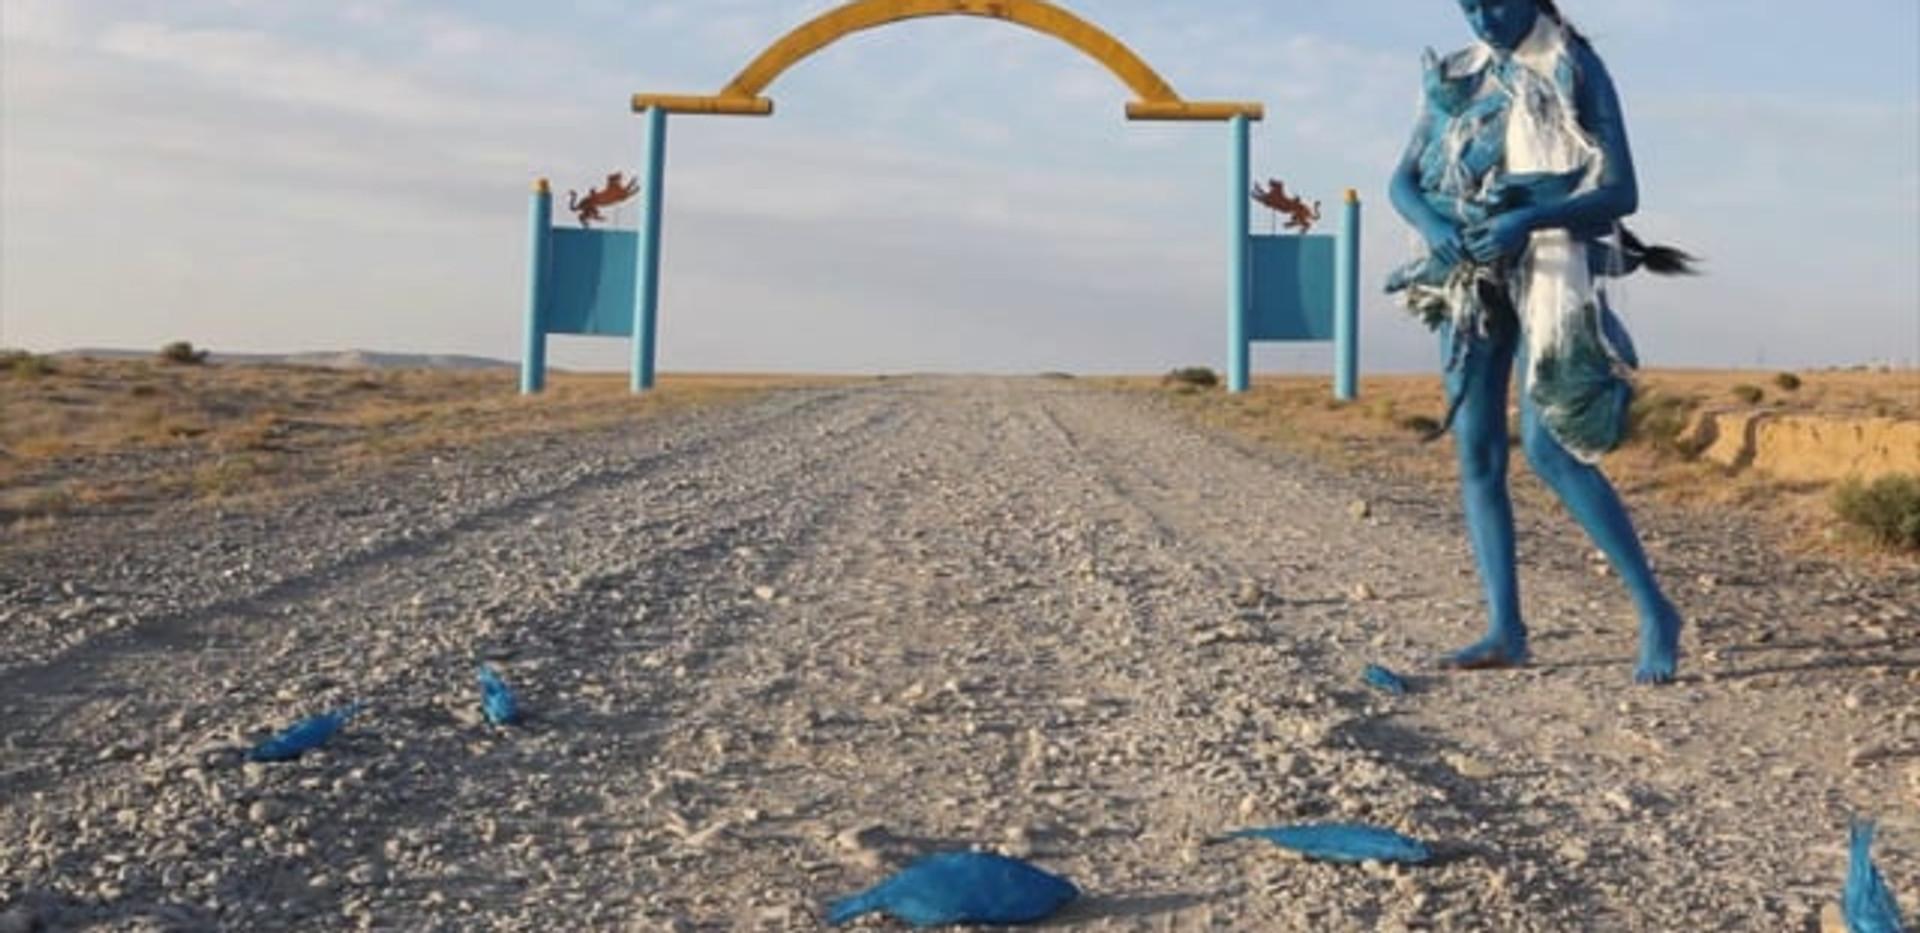 Aralsk testimony - Kazakhstan 2013 - Video of performance HD Video 8:46 - Edition of 5 + 2EA